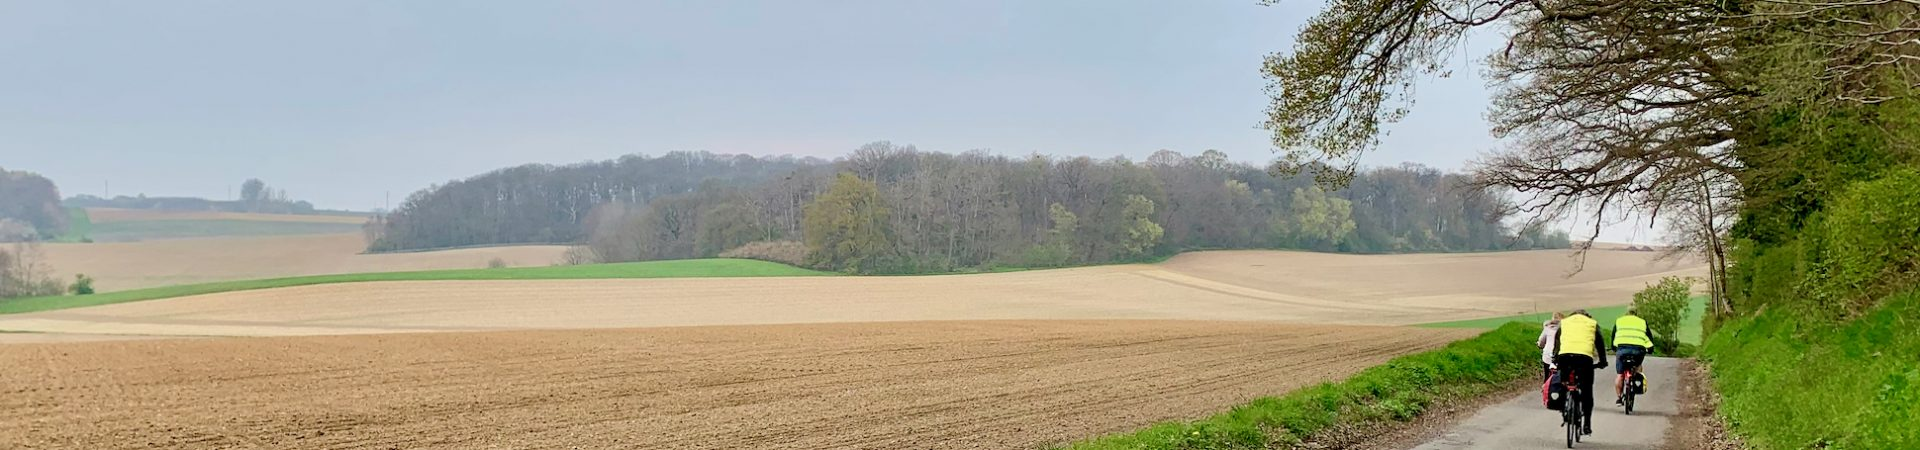 Fietsroute, fietsblog, fietsparadijs, Limburg, Haspengouw